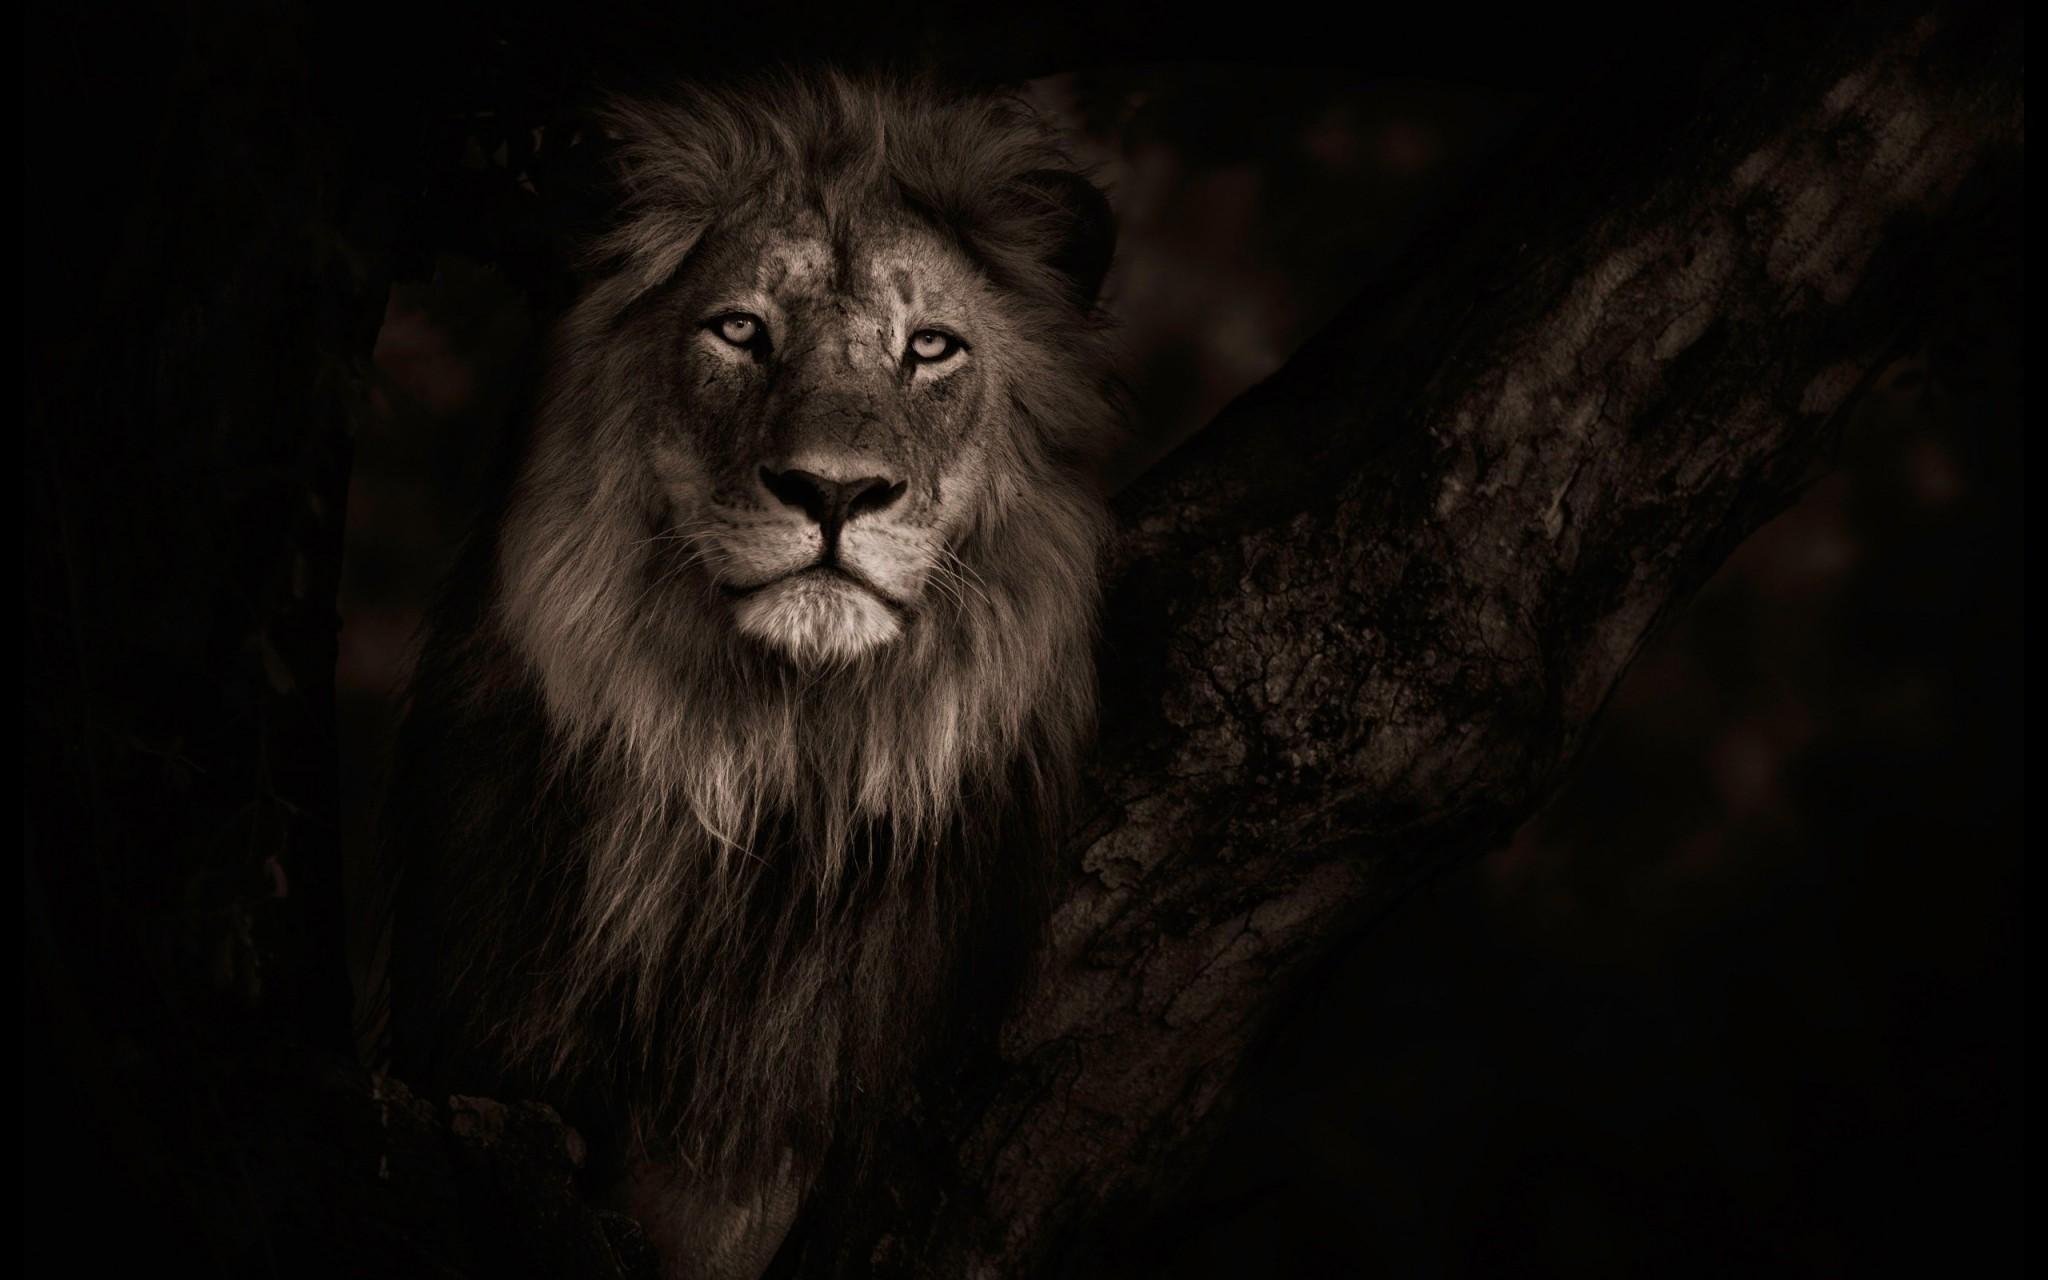 lion background ·① download free full hd backgrounds for desktop